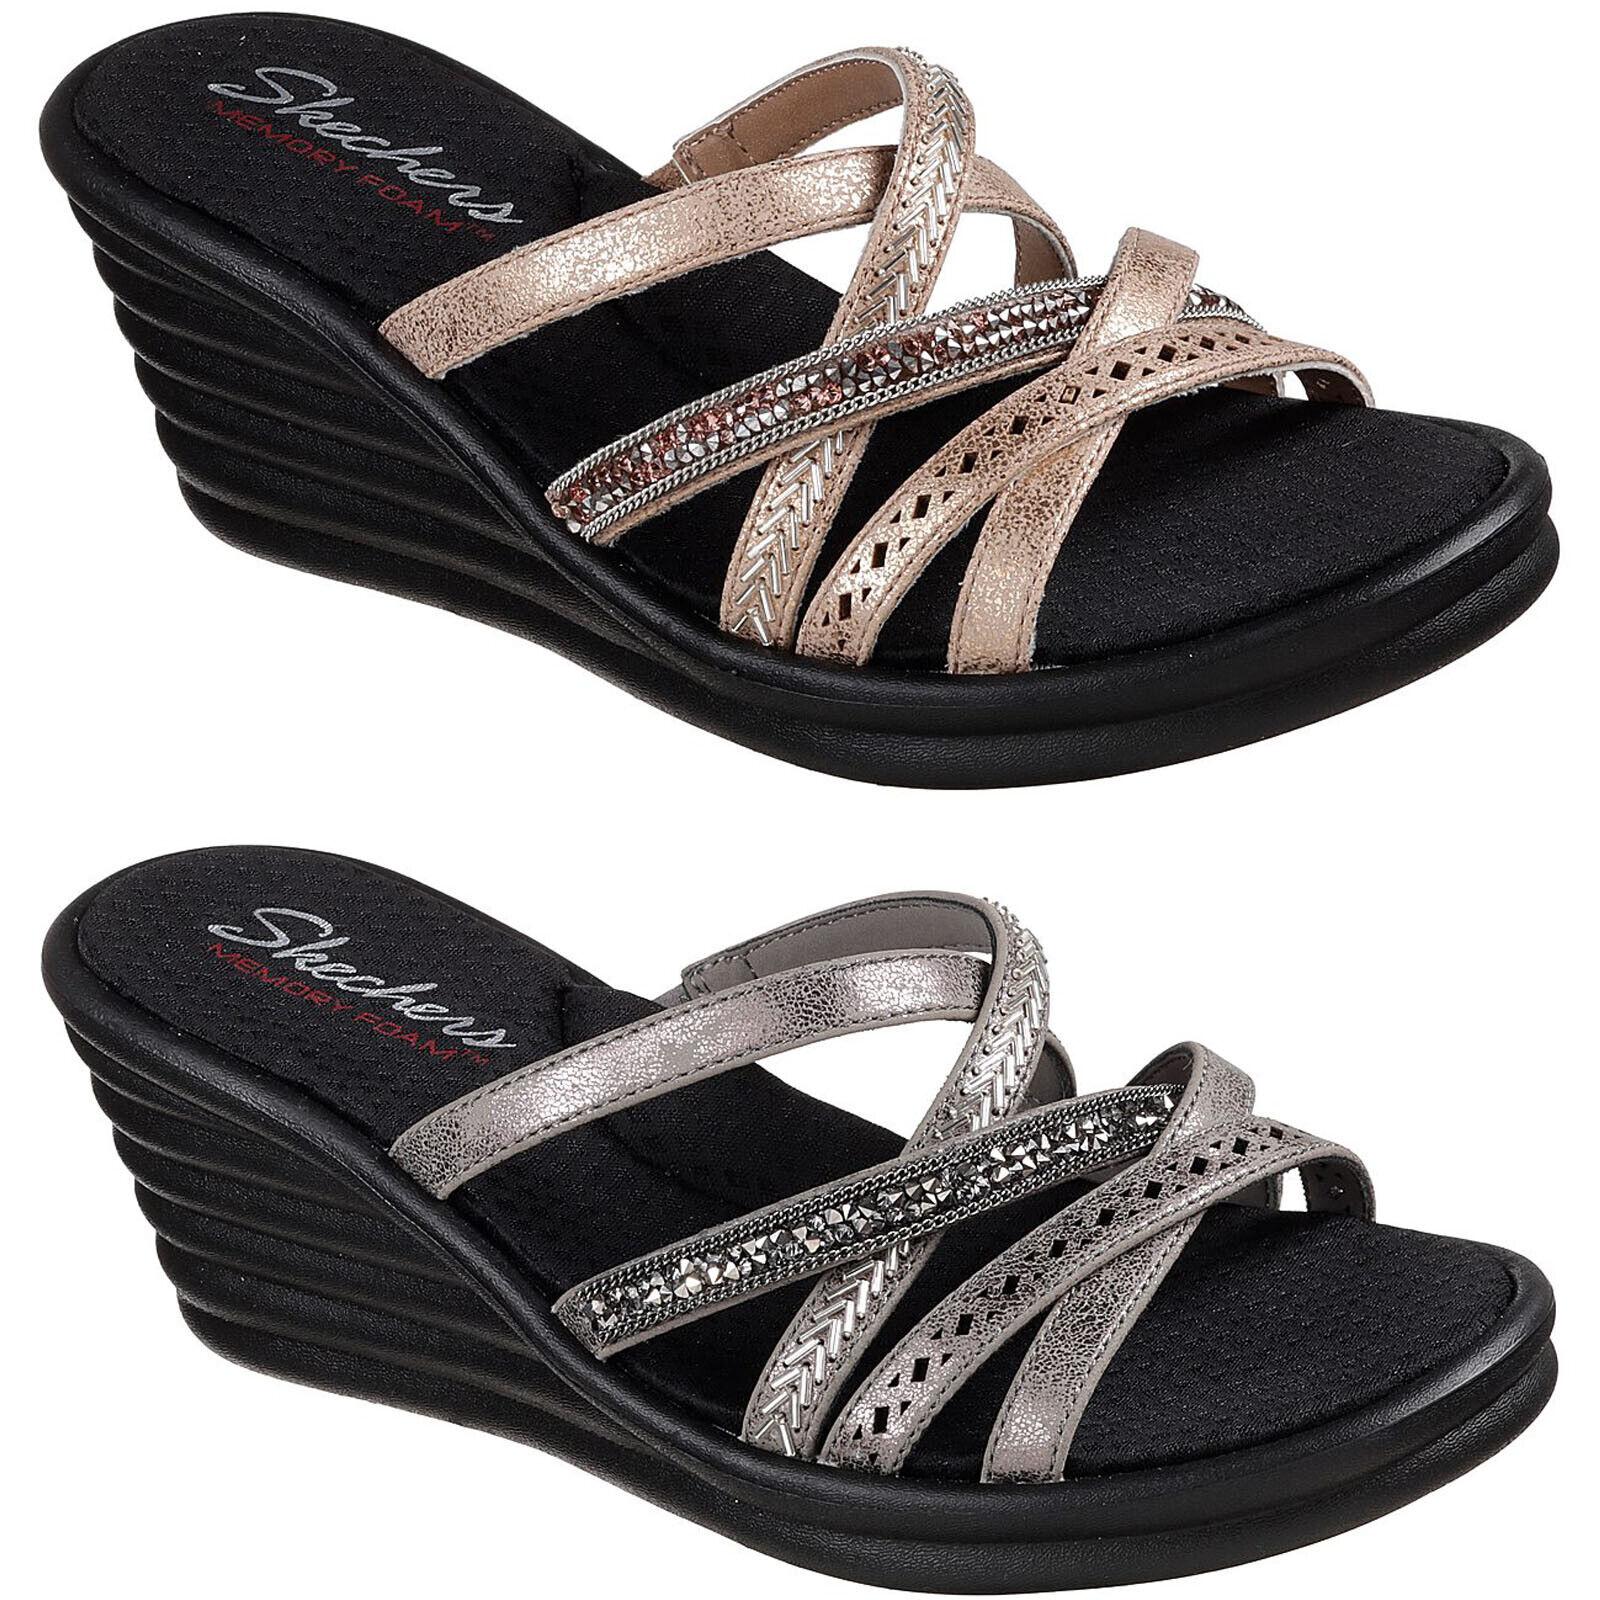 Skechers Rumblers Wave - New Lassie Sandals Womens Wedge Strap Summer shoes 31777